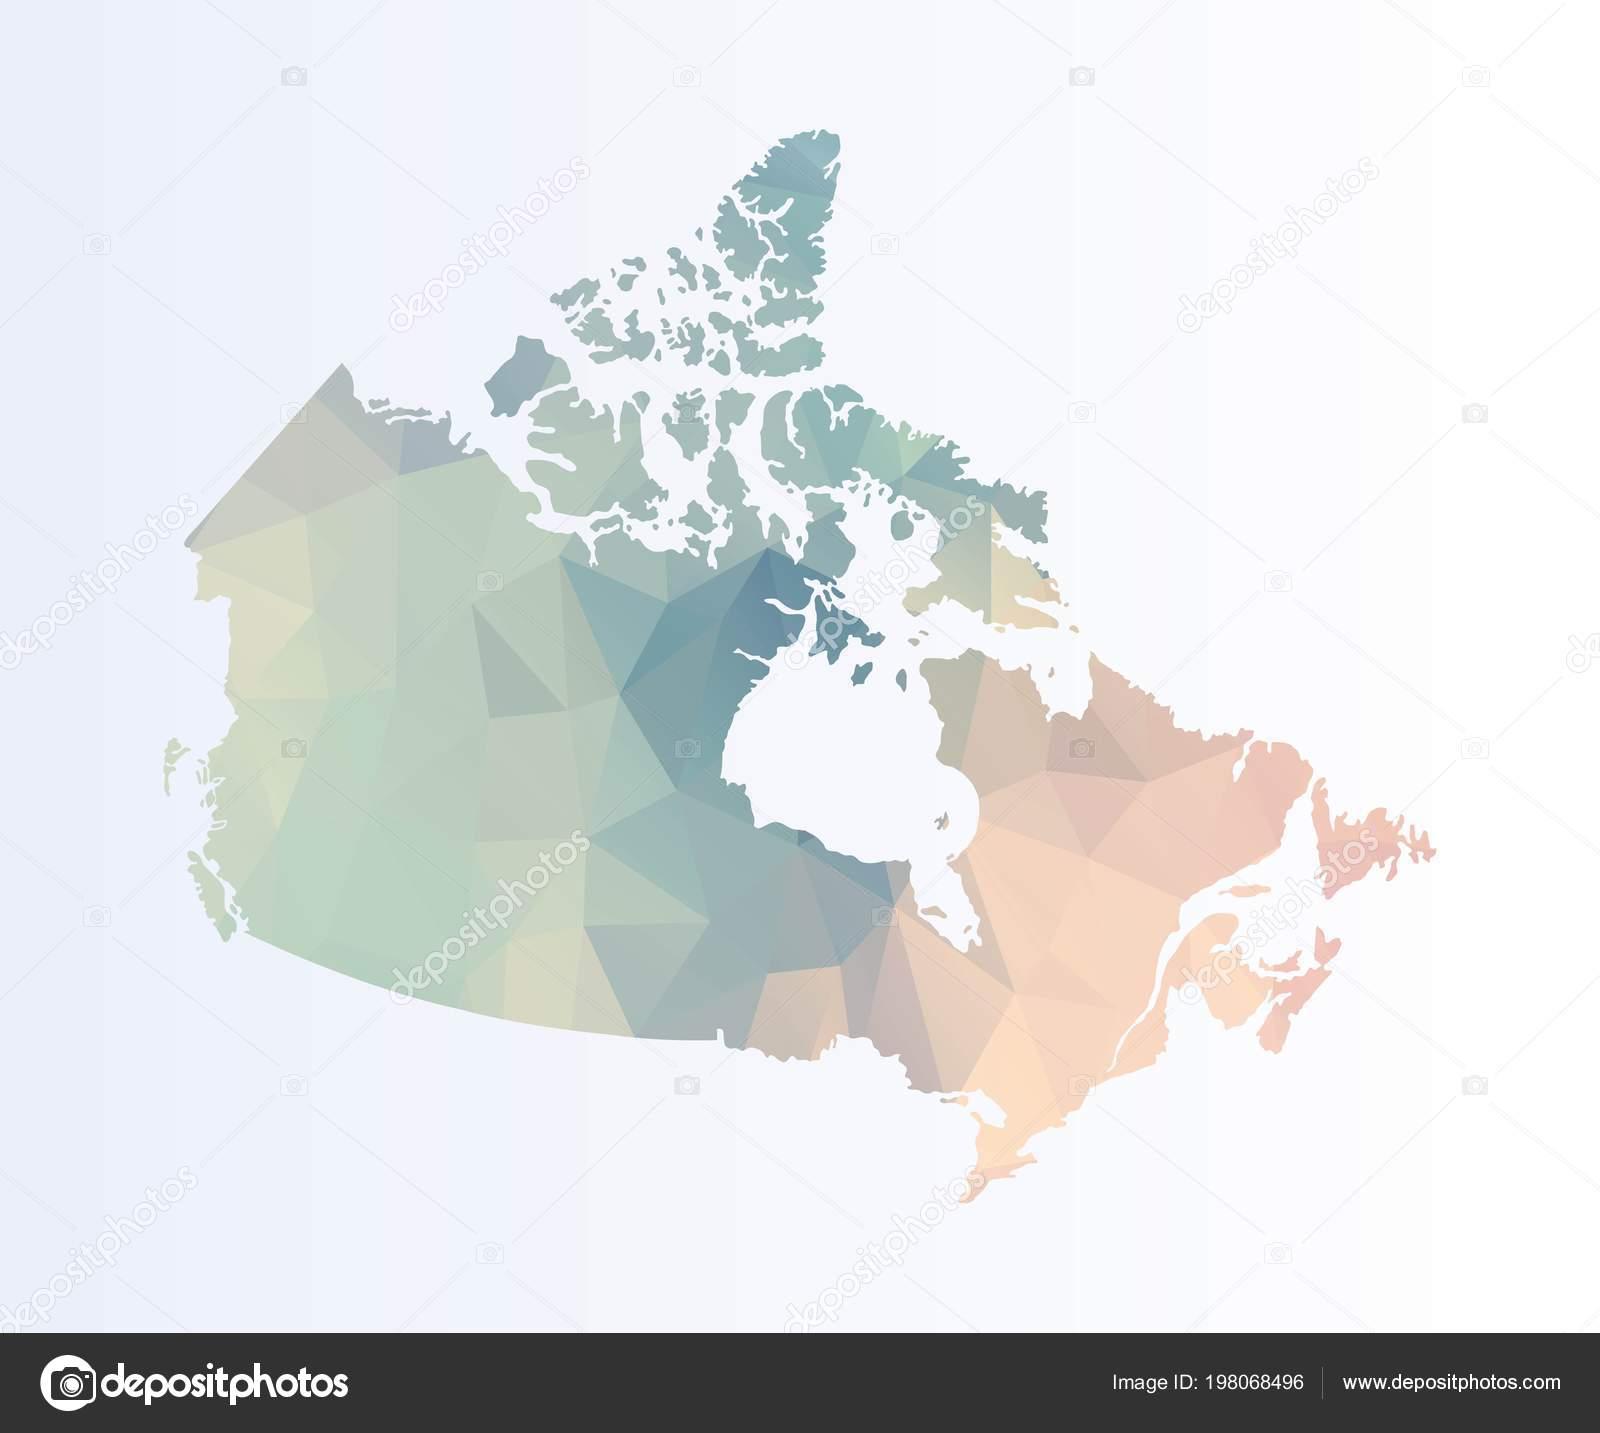 Map Of Canada Download.Polygonal Map Canada Stock Vector C Blacklava36 198068496